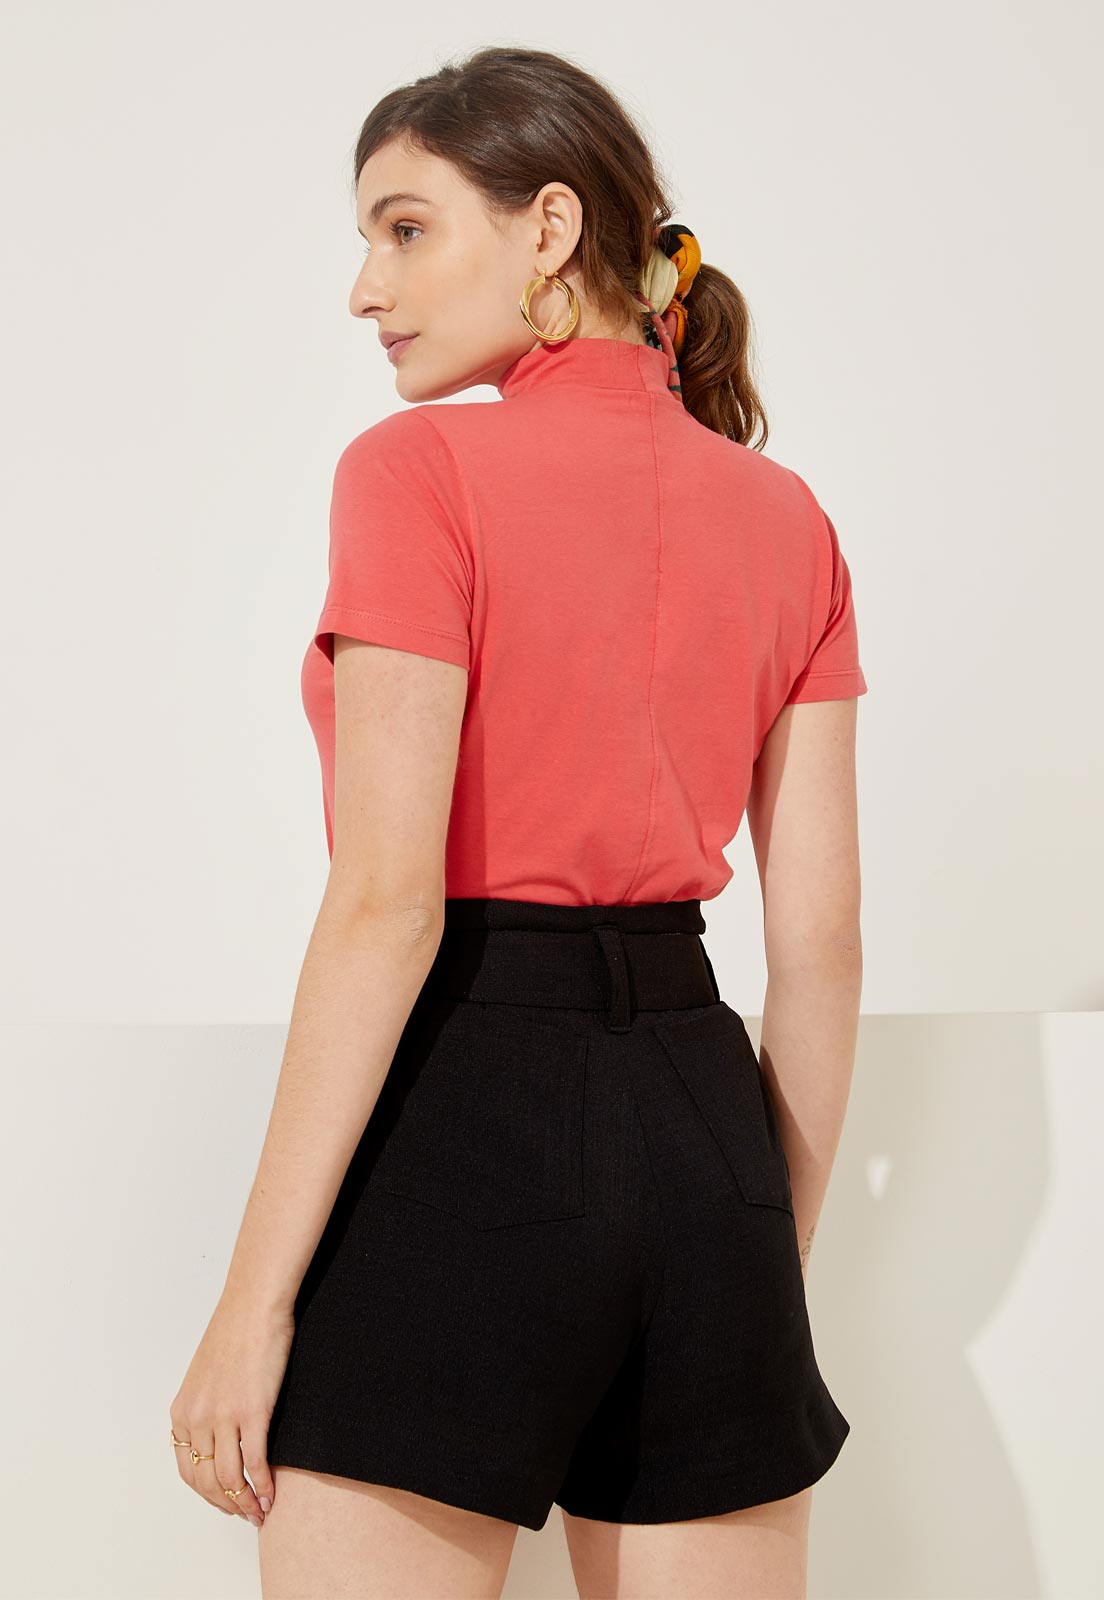 T-shirt Ana Burnt Coral